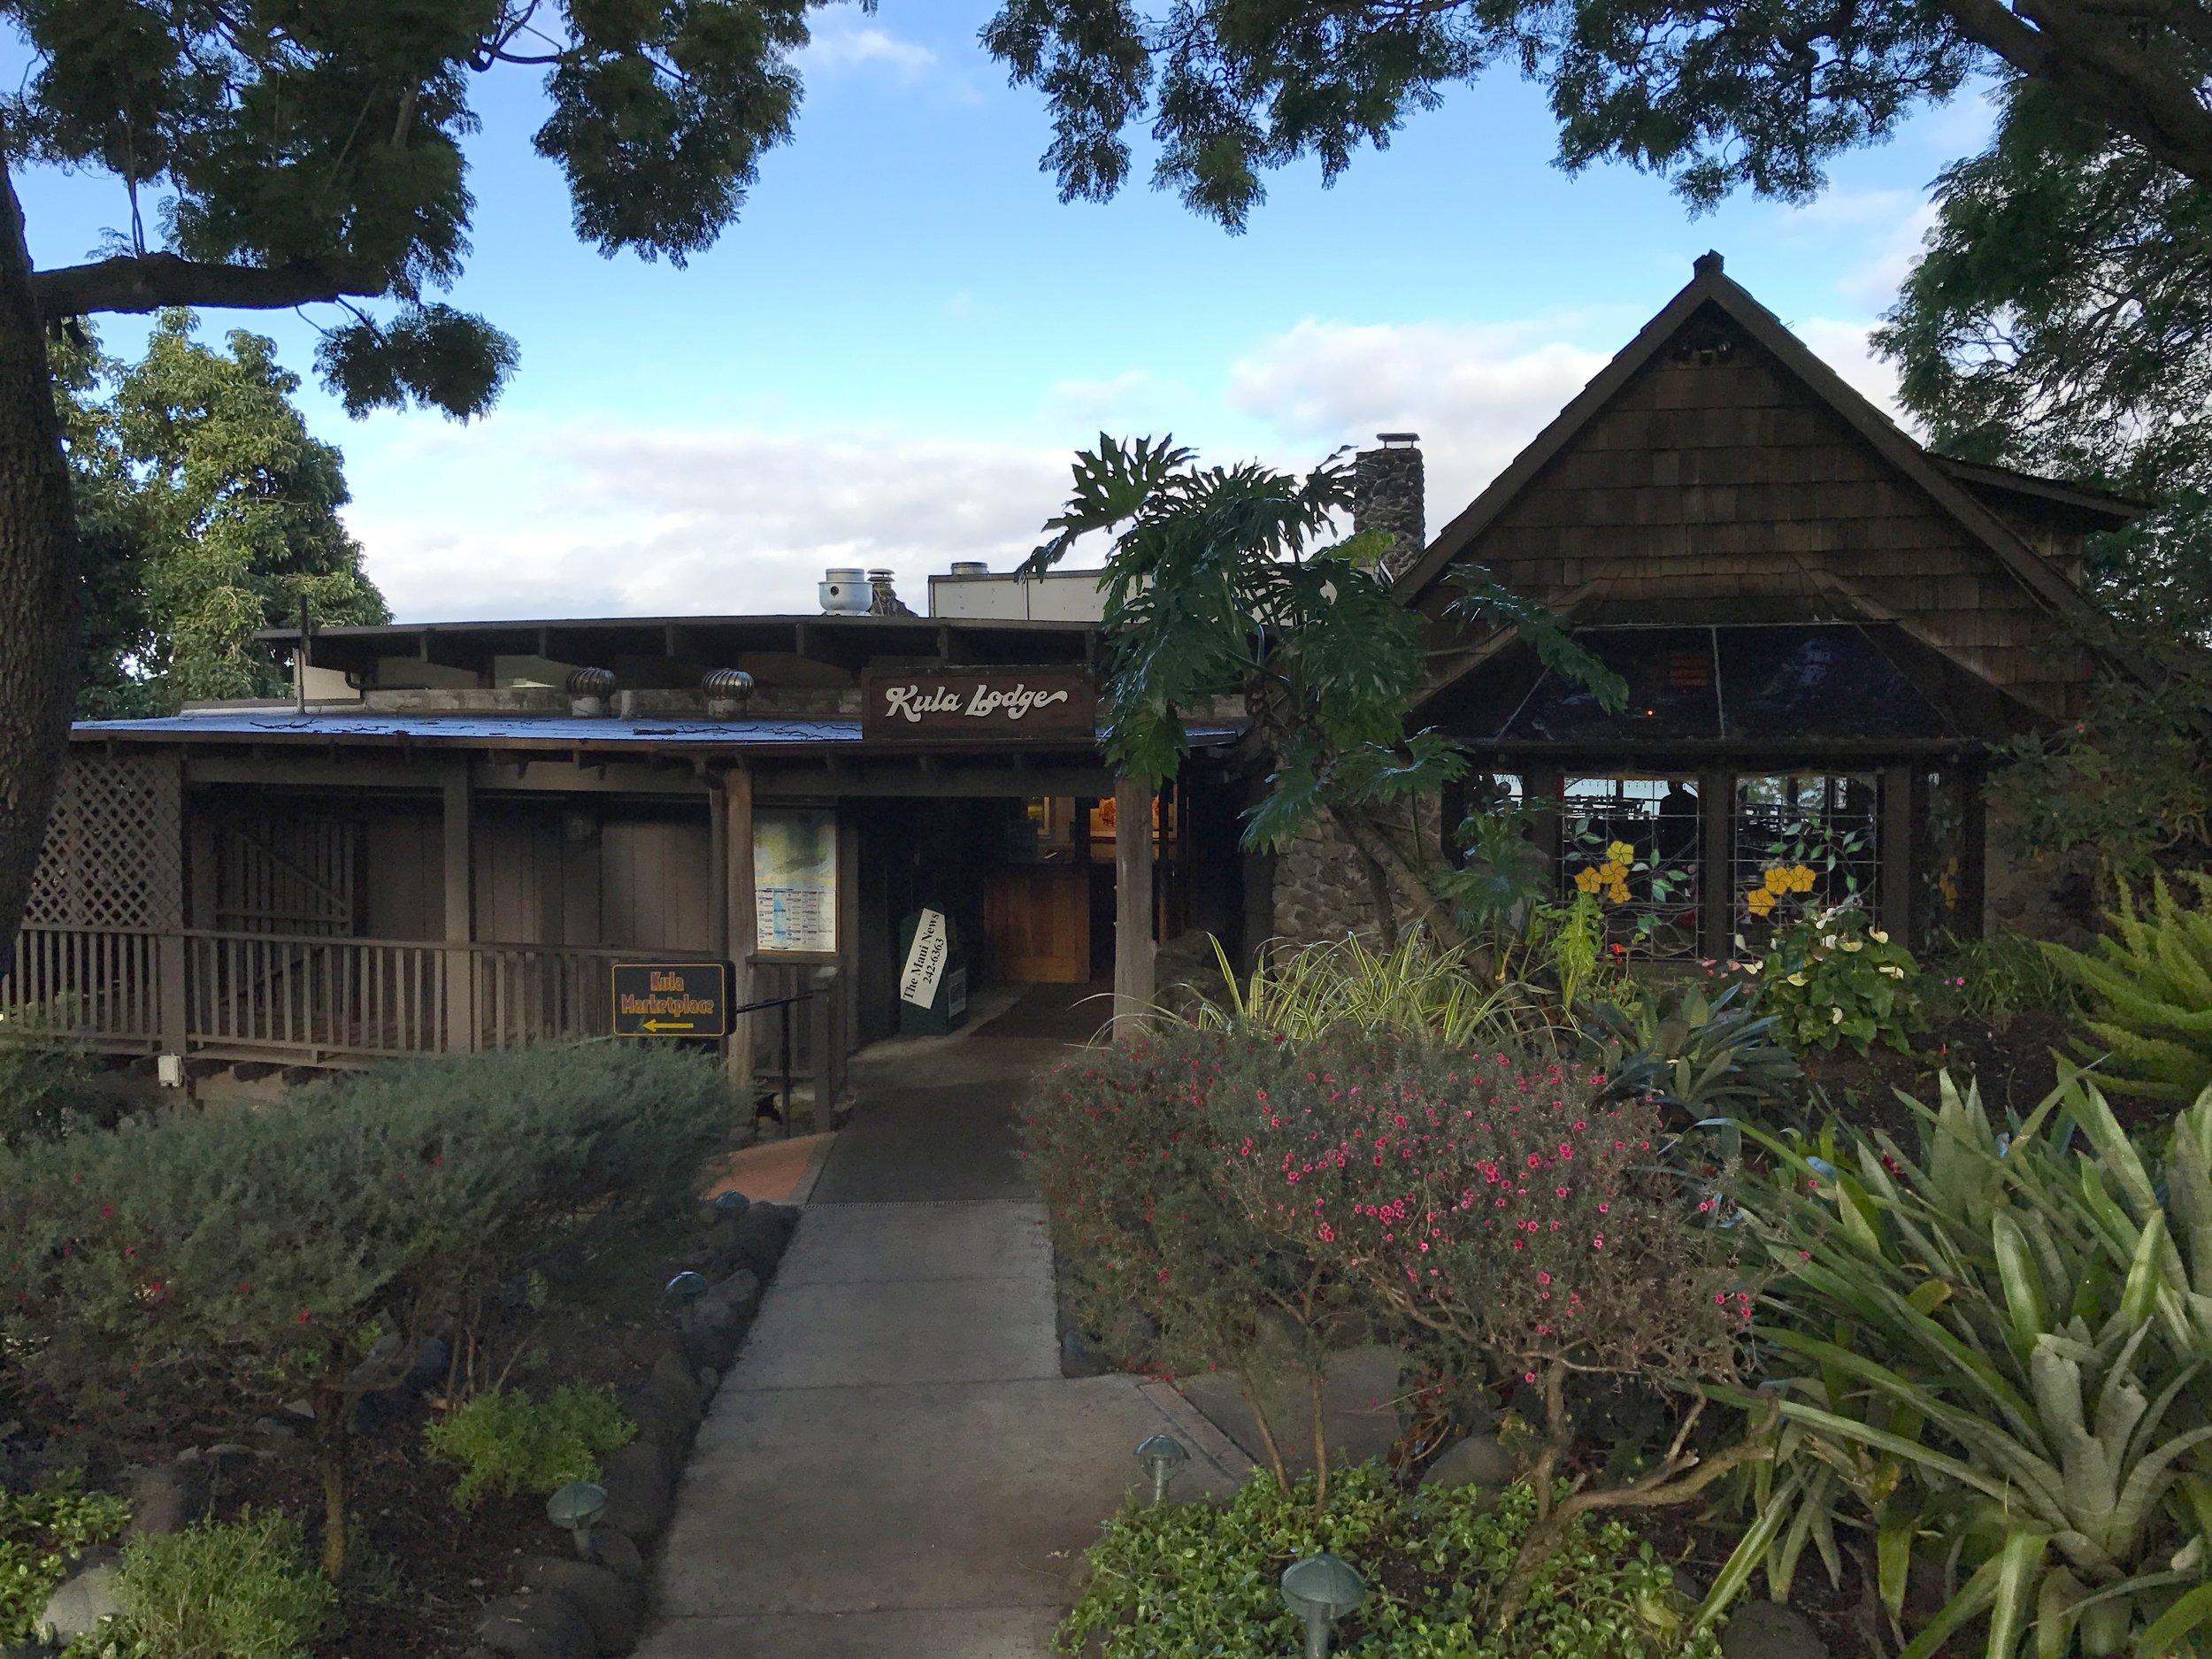 kula-lodge-breakfast-with-view-maui